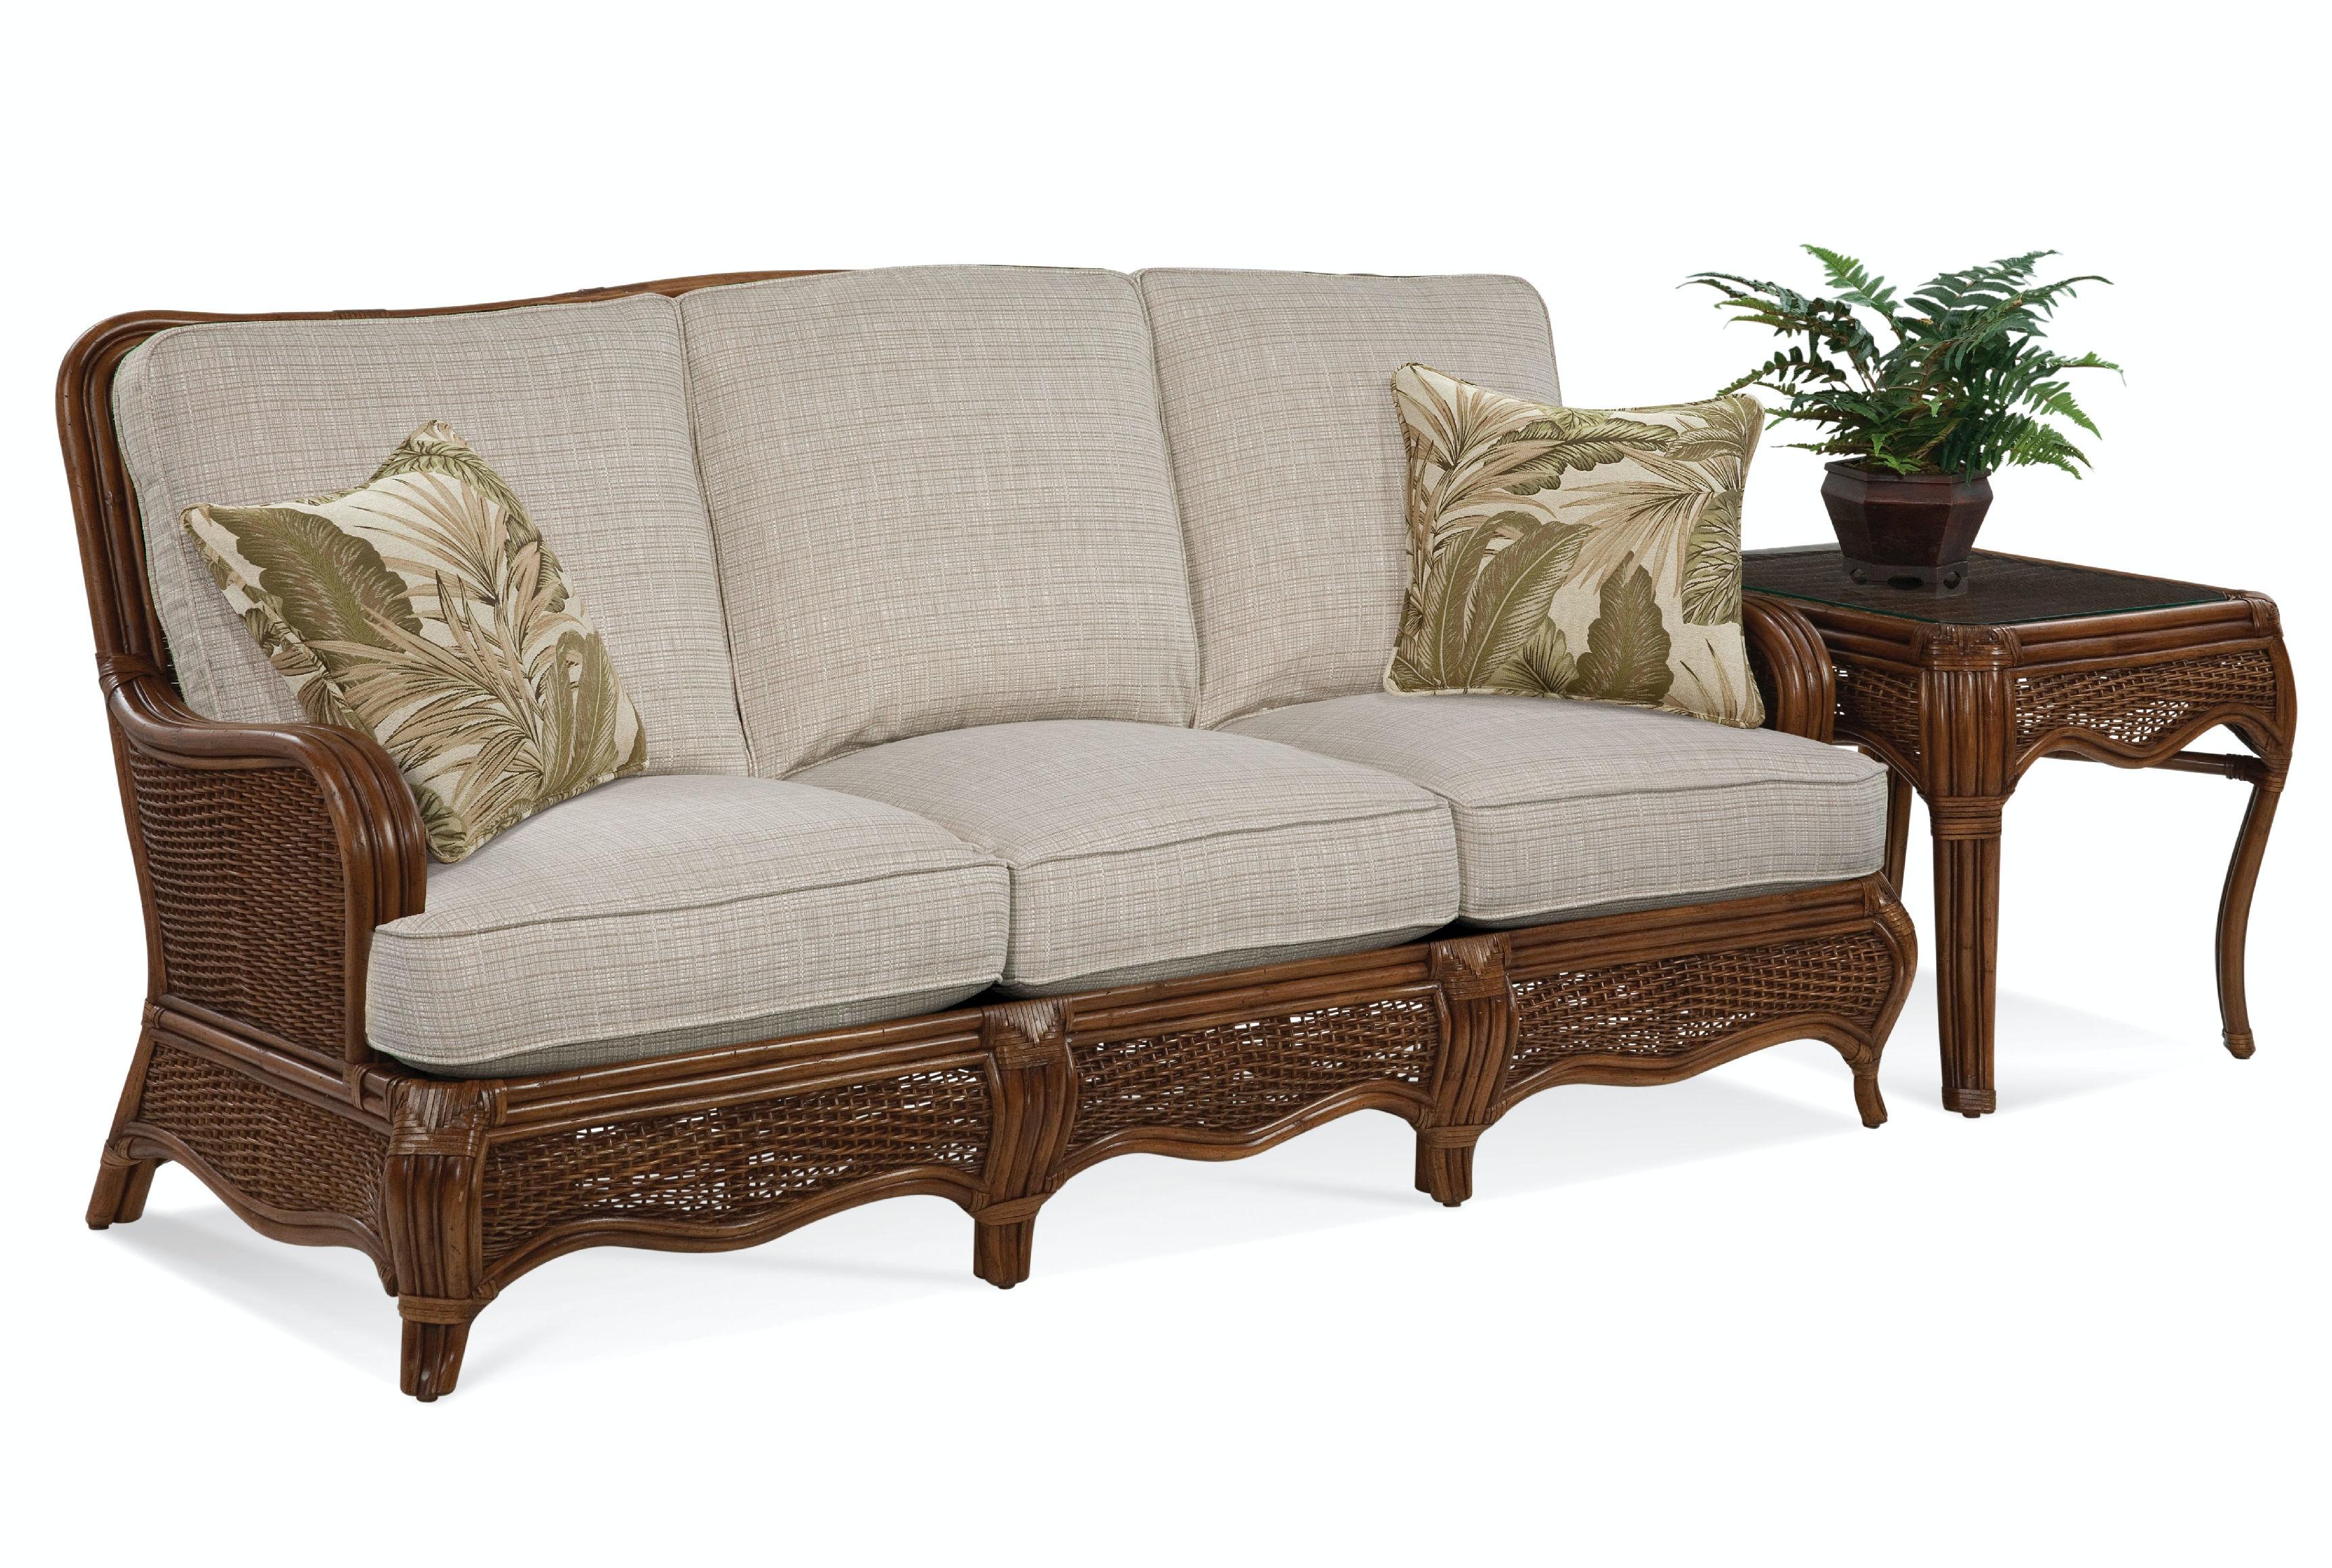 Bon Braxton Culler Sofa 1910 011